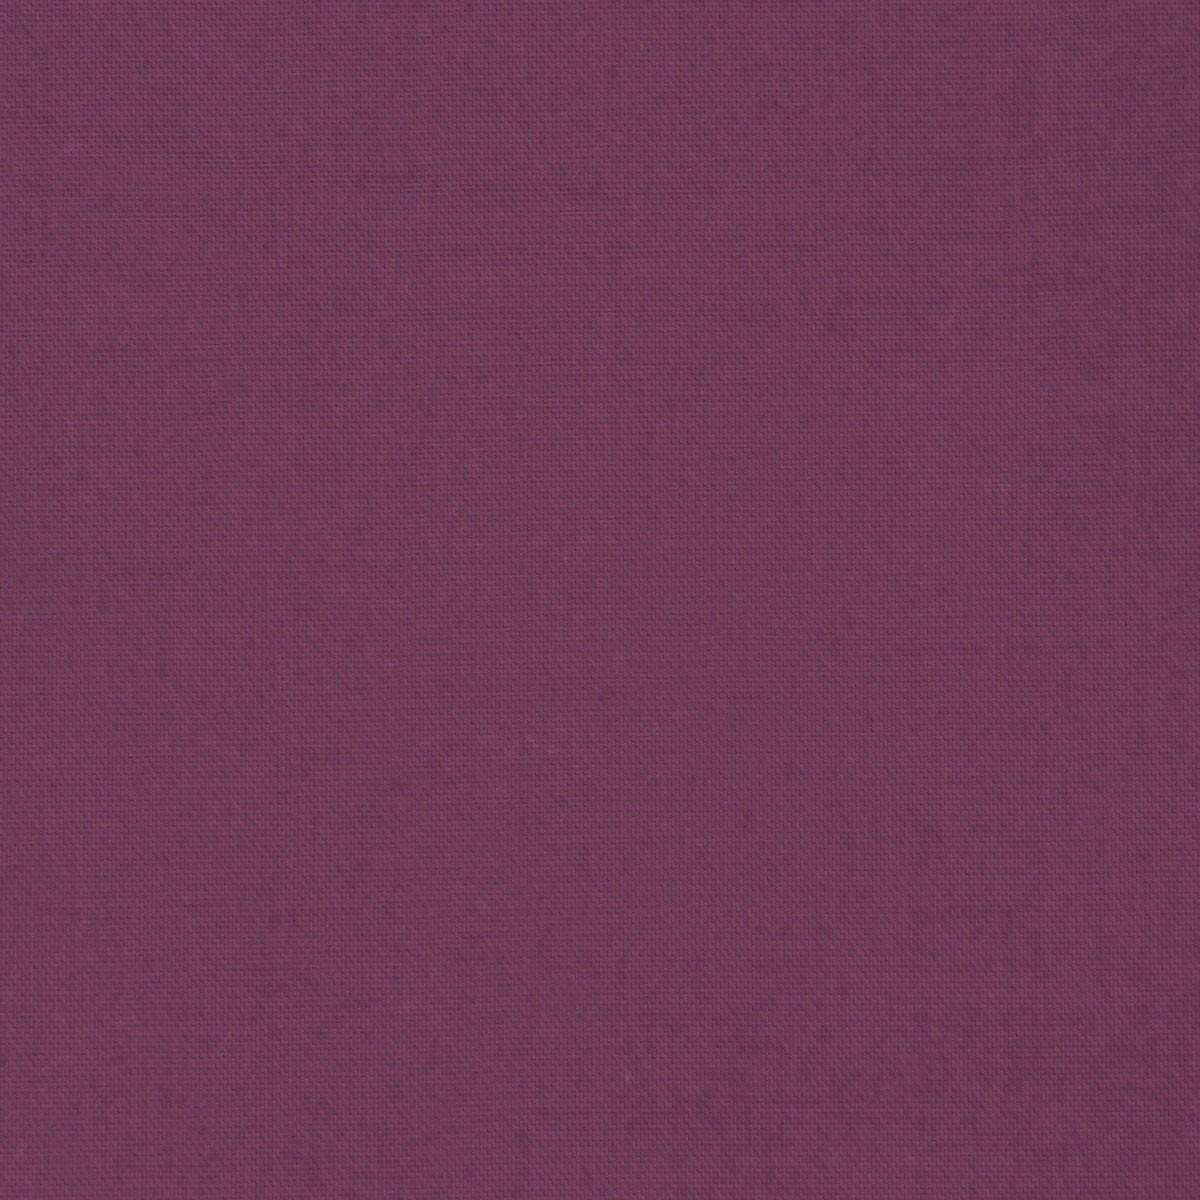 Halbpanama Dekostoff Baumwollstoff sanforisiert uni pflaume 1,40m breit